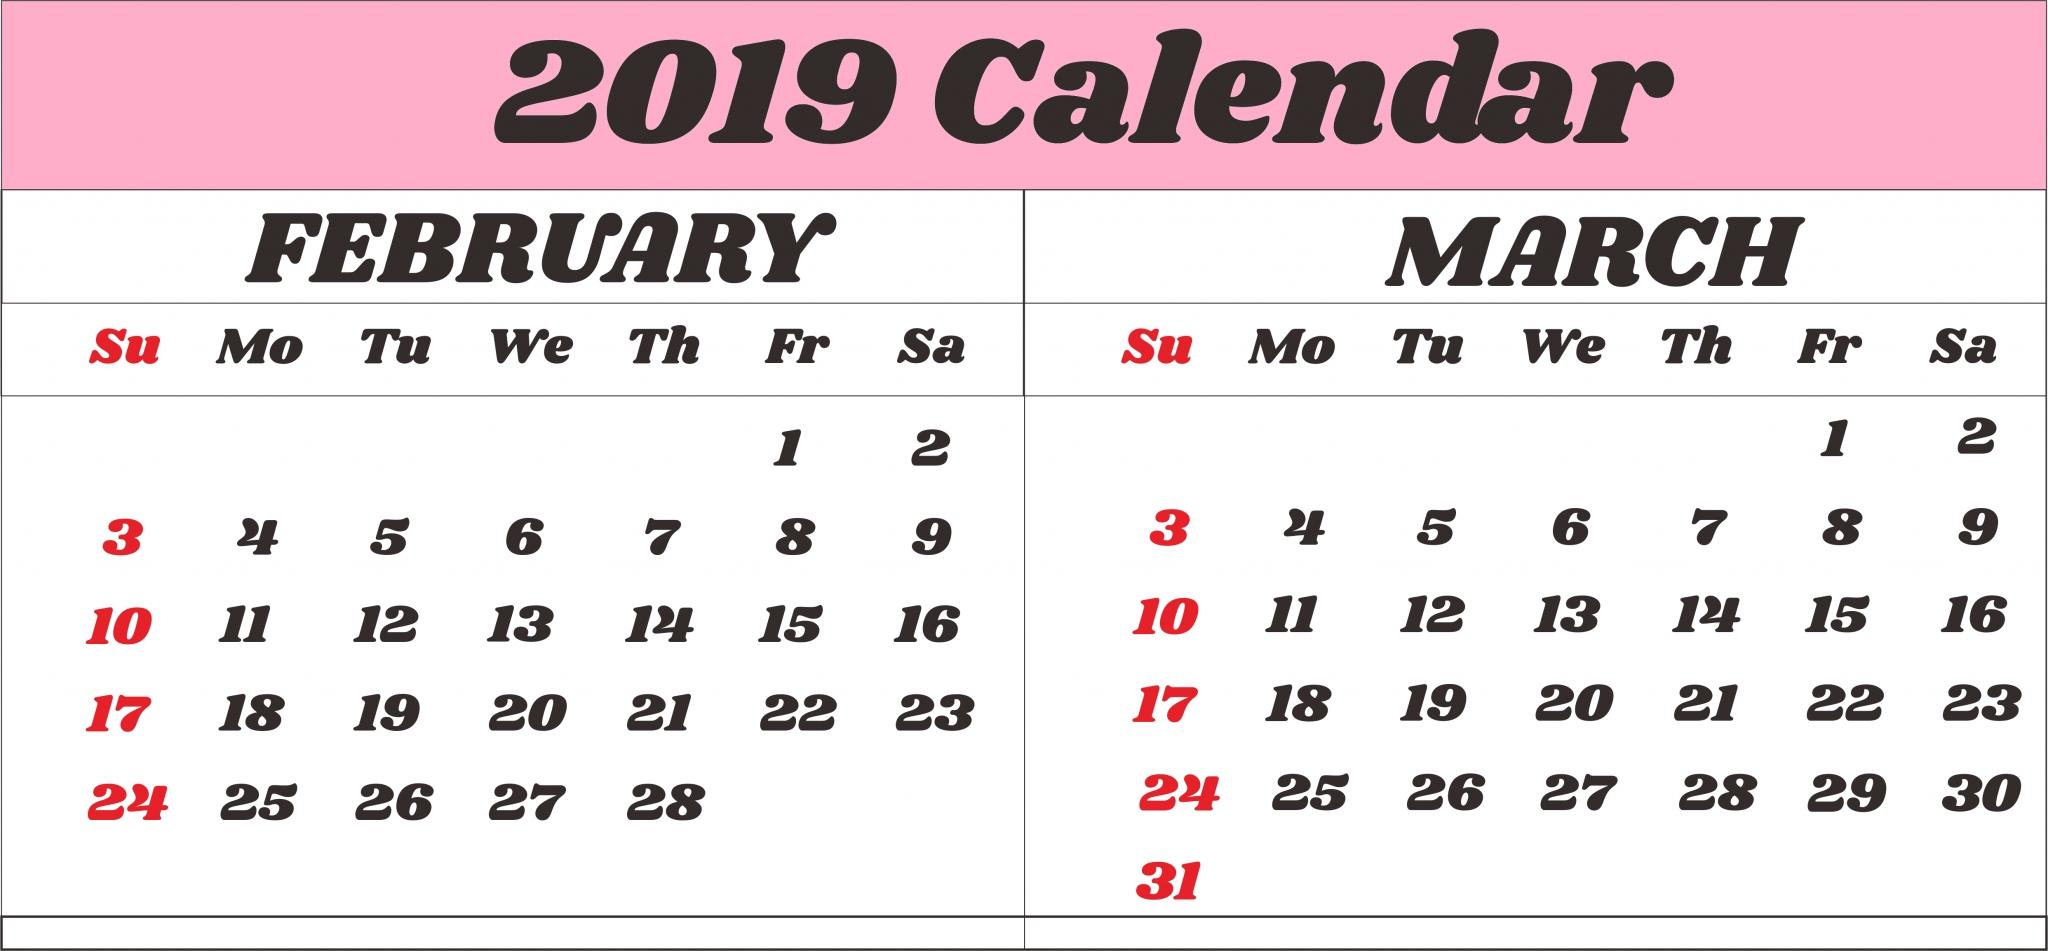 Calendar February March 2019 Printable #feb #february2019 Calendar Feb 9 2019